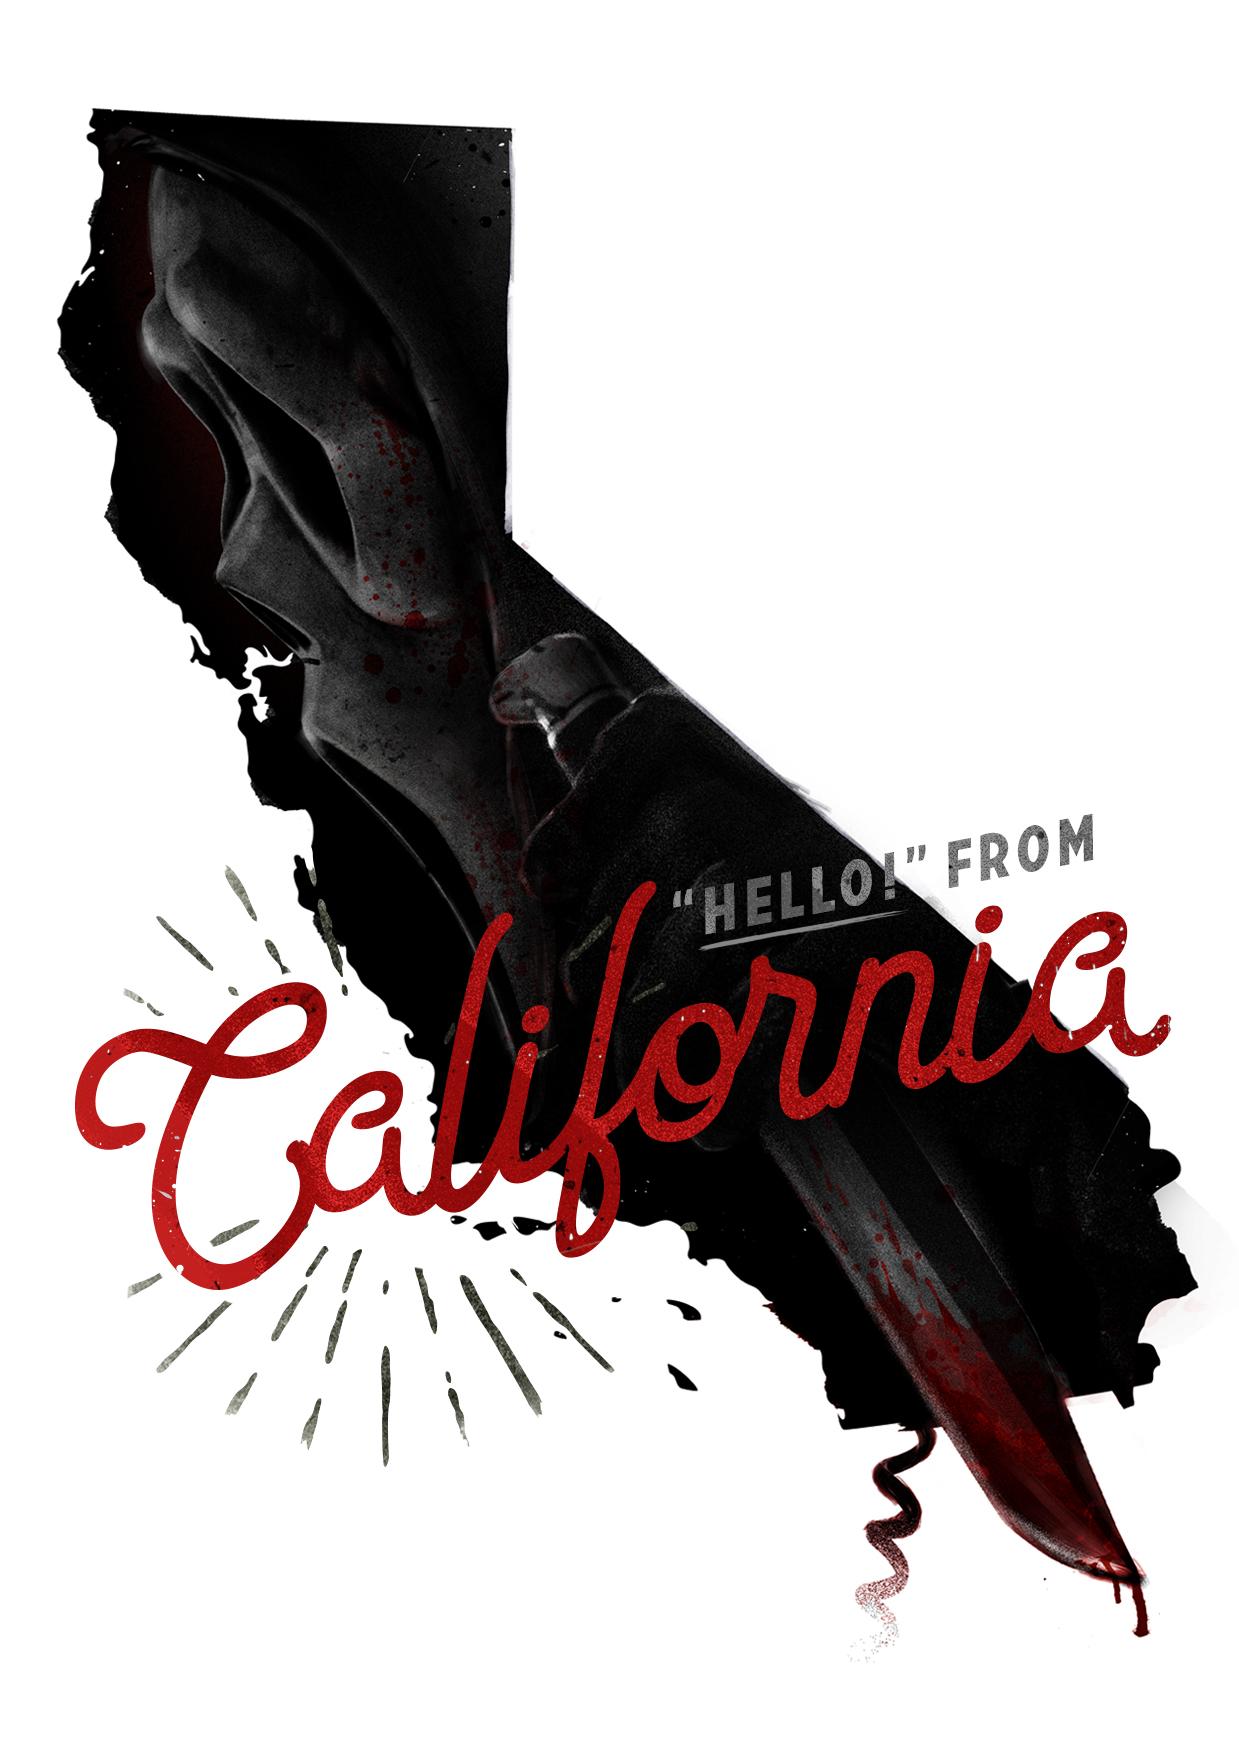 USofHorror-Postcards-California.jpg